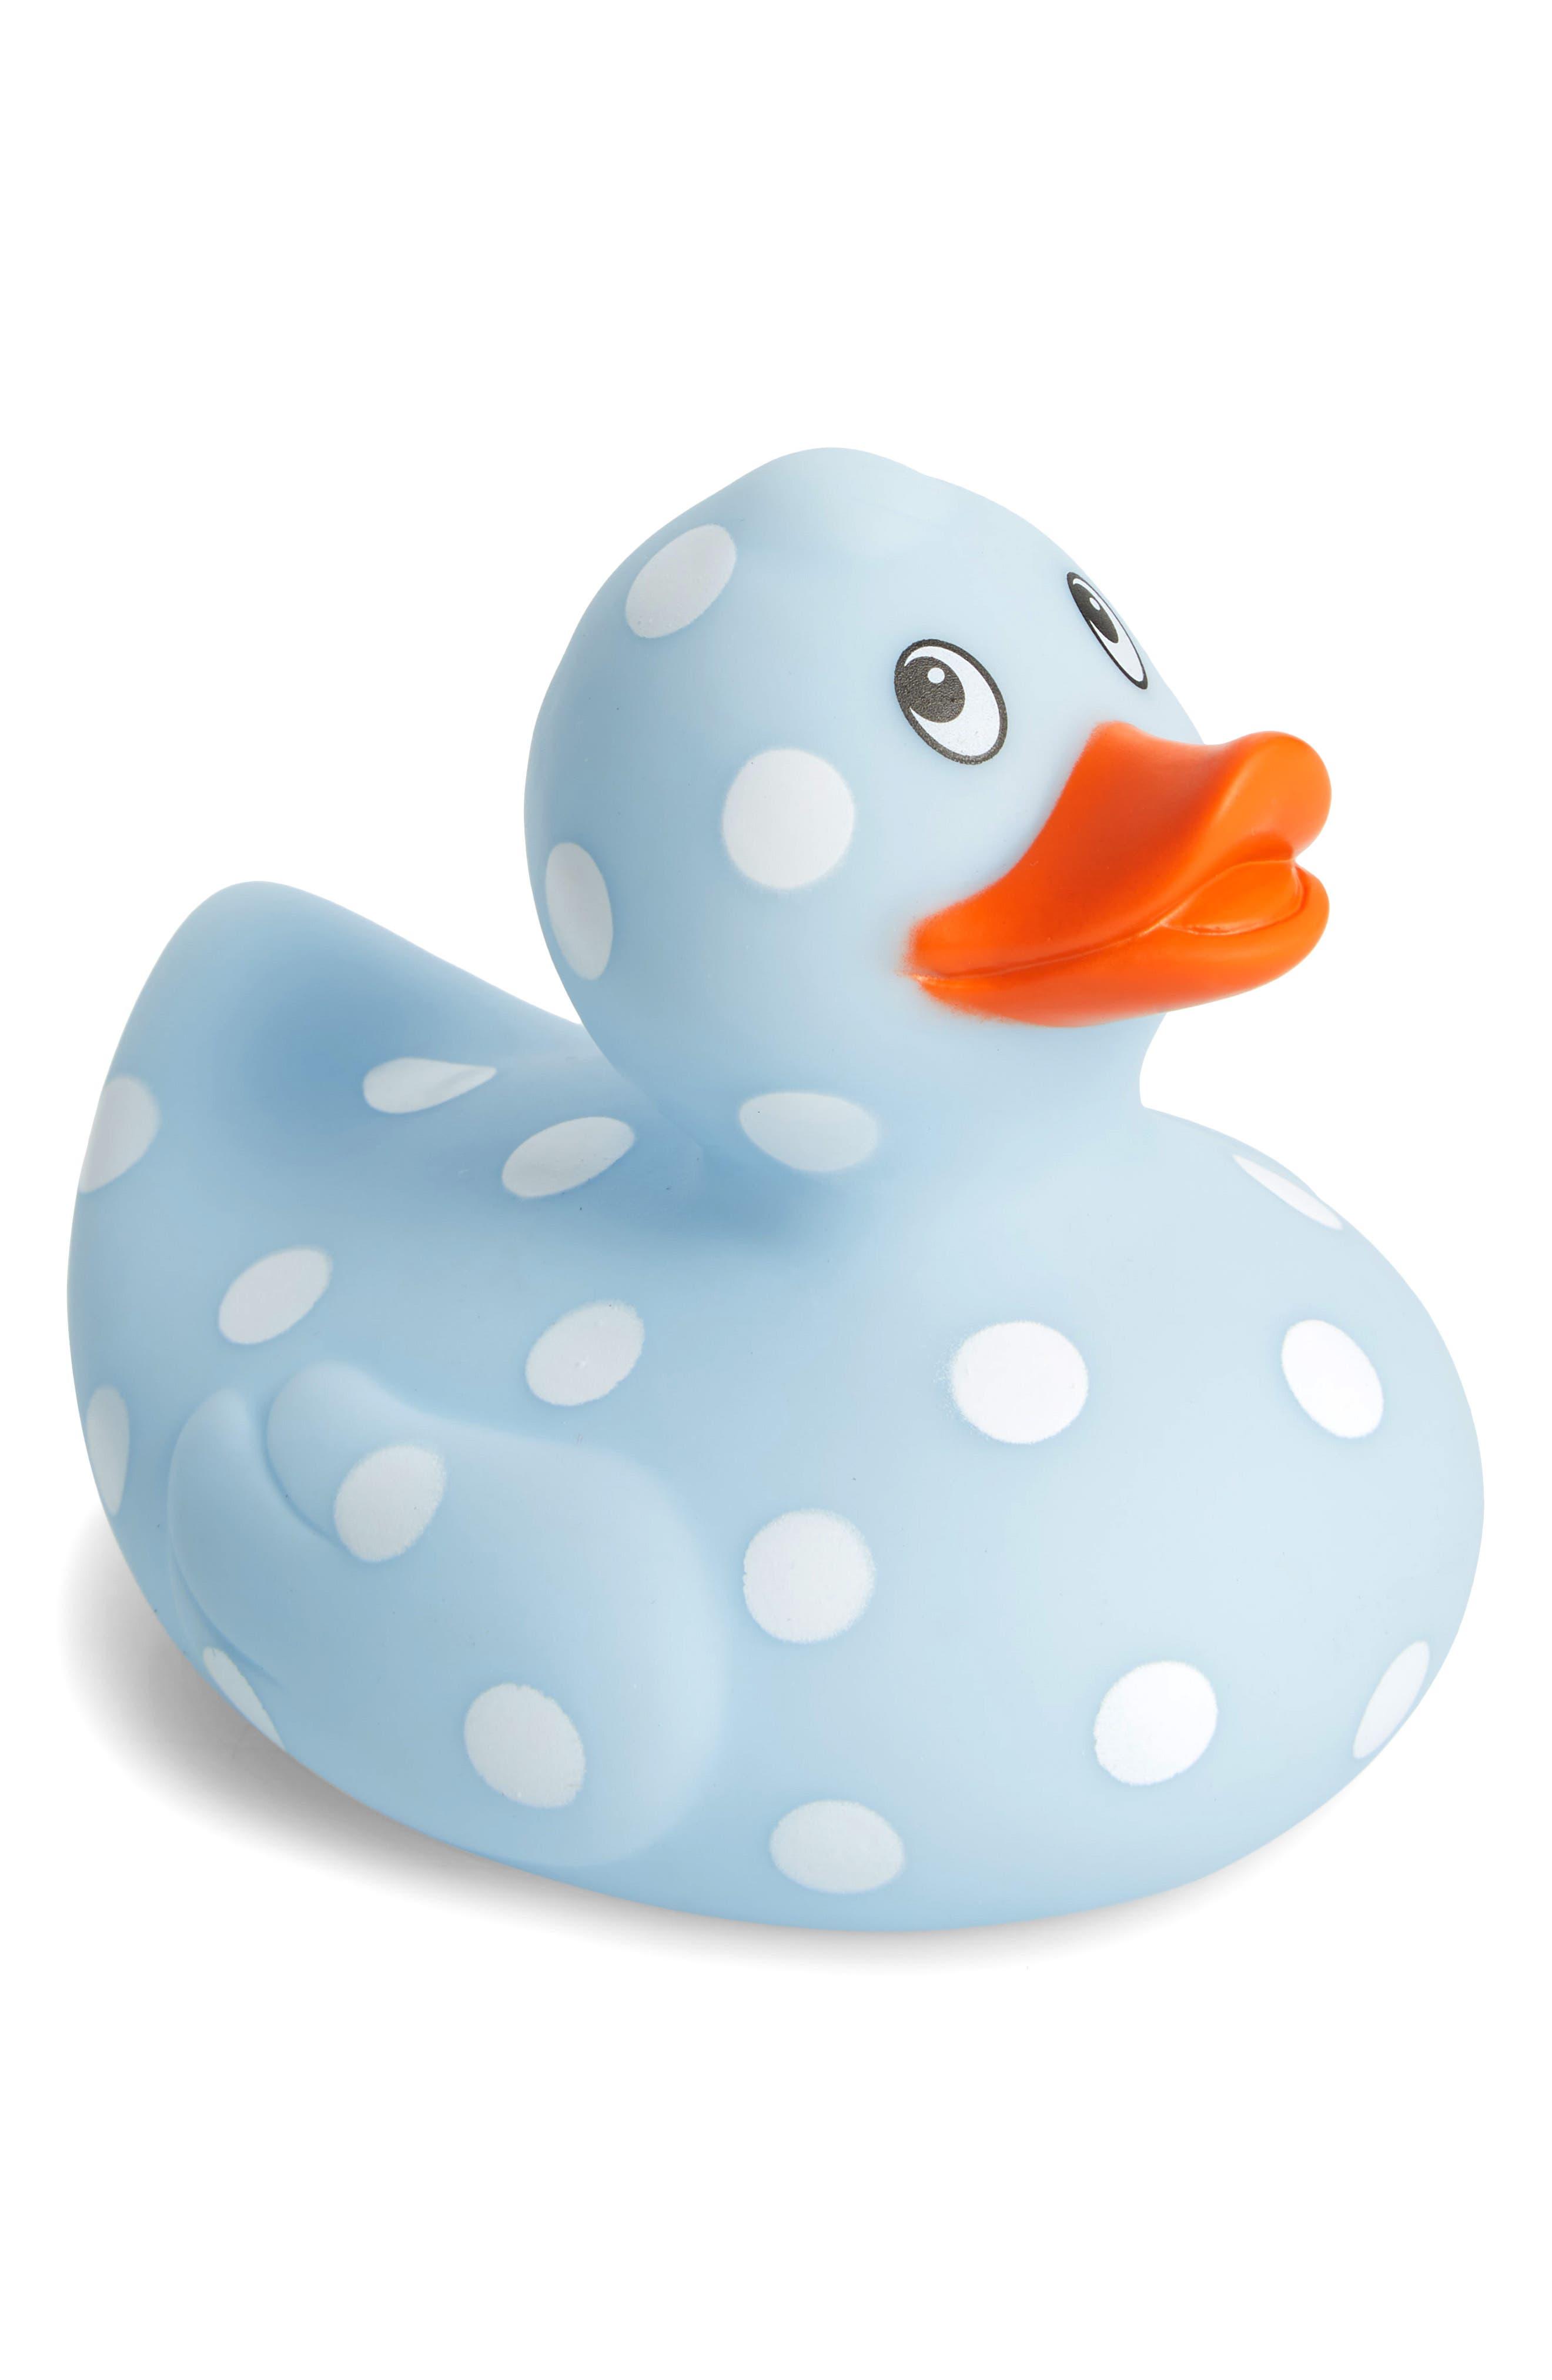 Blue Polka Dot Rubber Duck Bath Toy,                             Main thumbnail 1, color,                             400